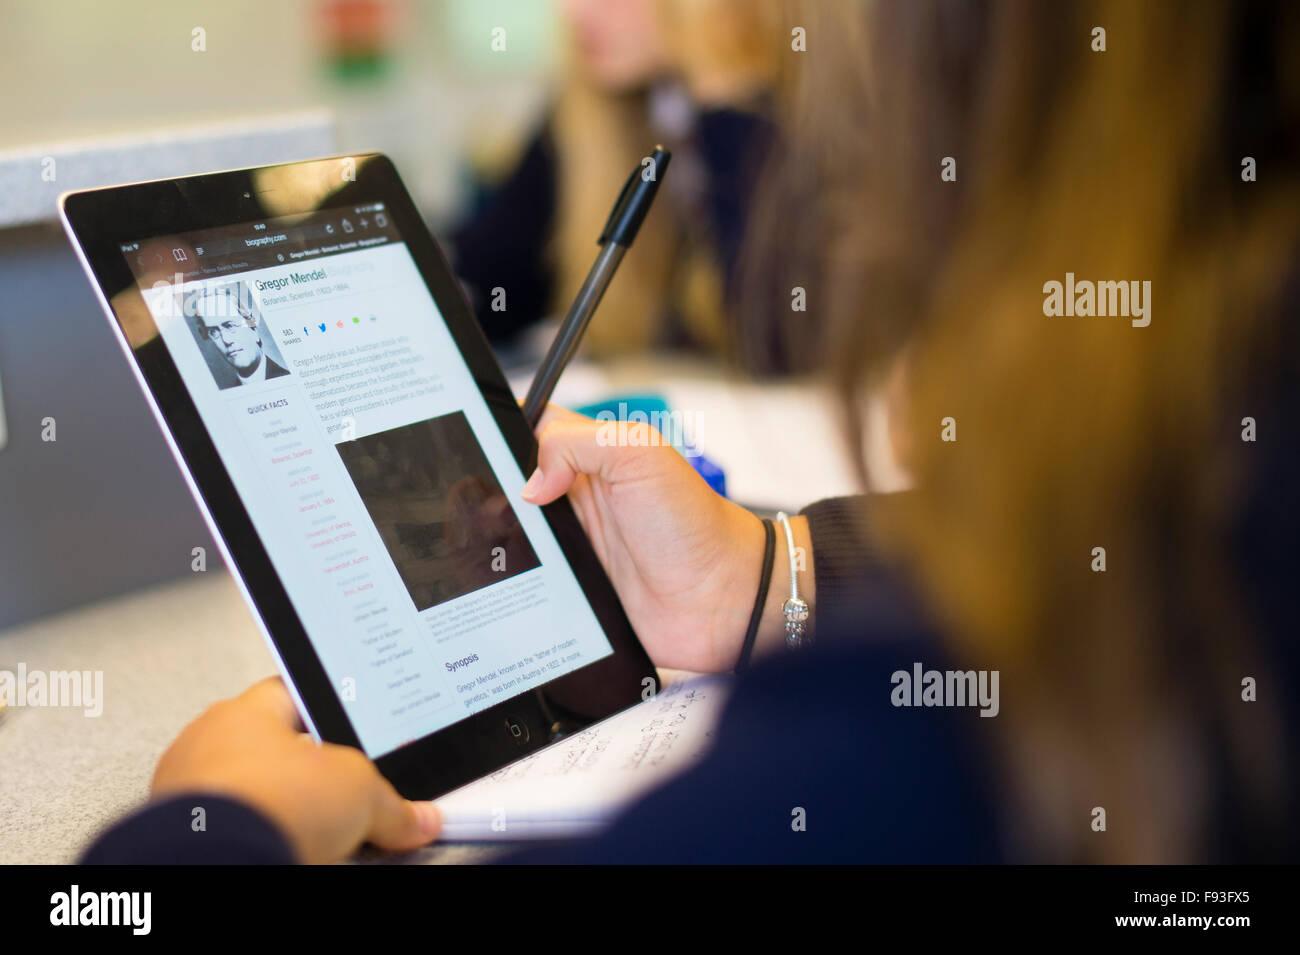 Sekundarstufe II Wales UK: Student Schüler mittels Informationstechnologie (Apple iPad Tablet-Computer), um Stockbild